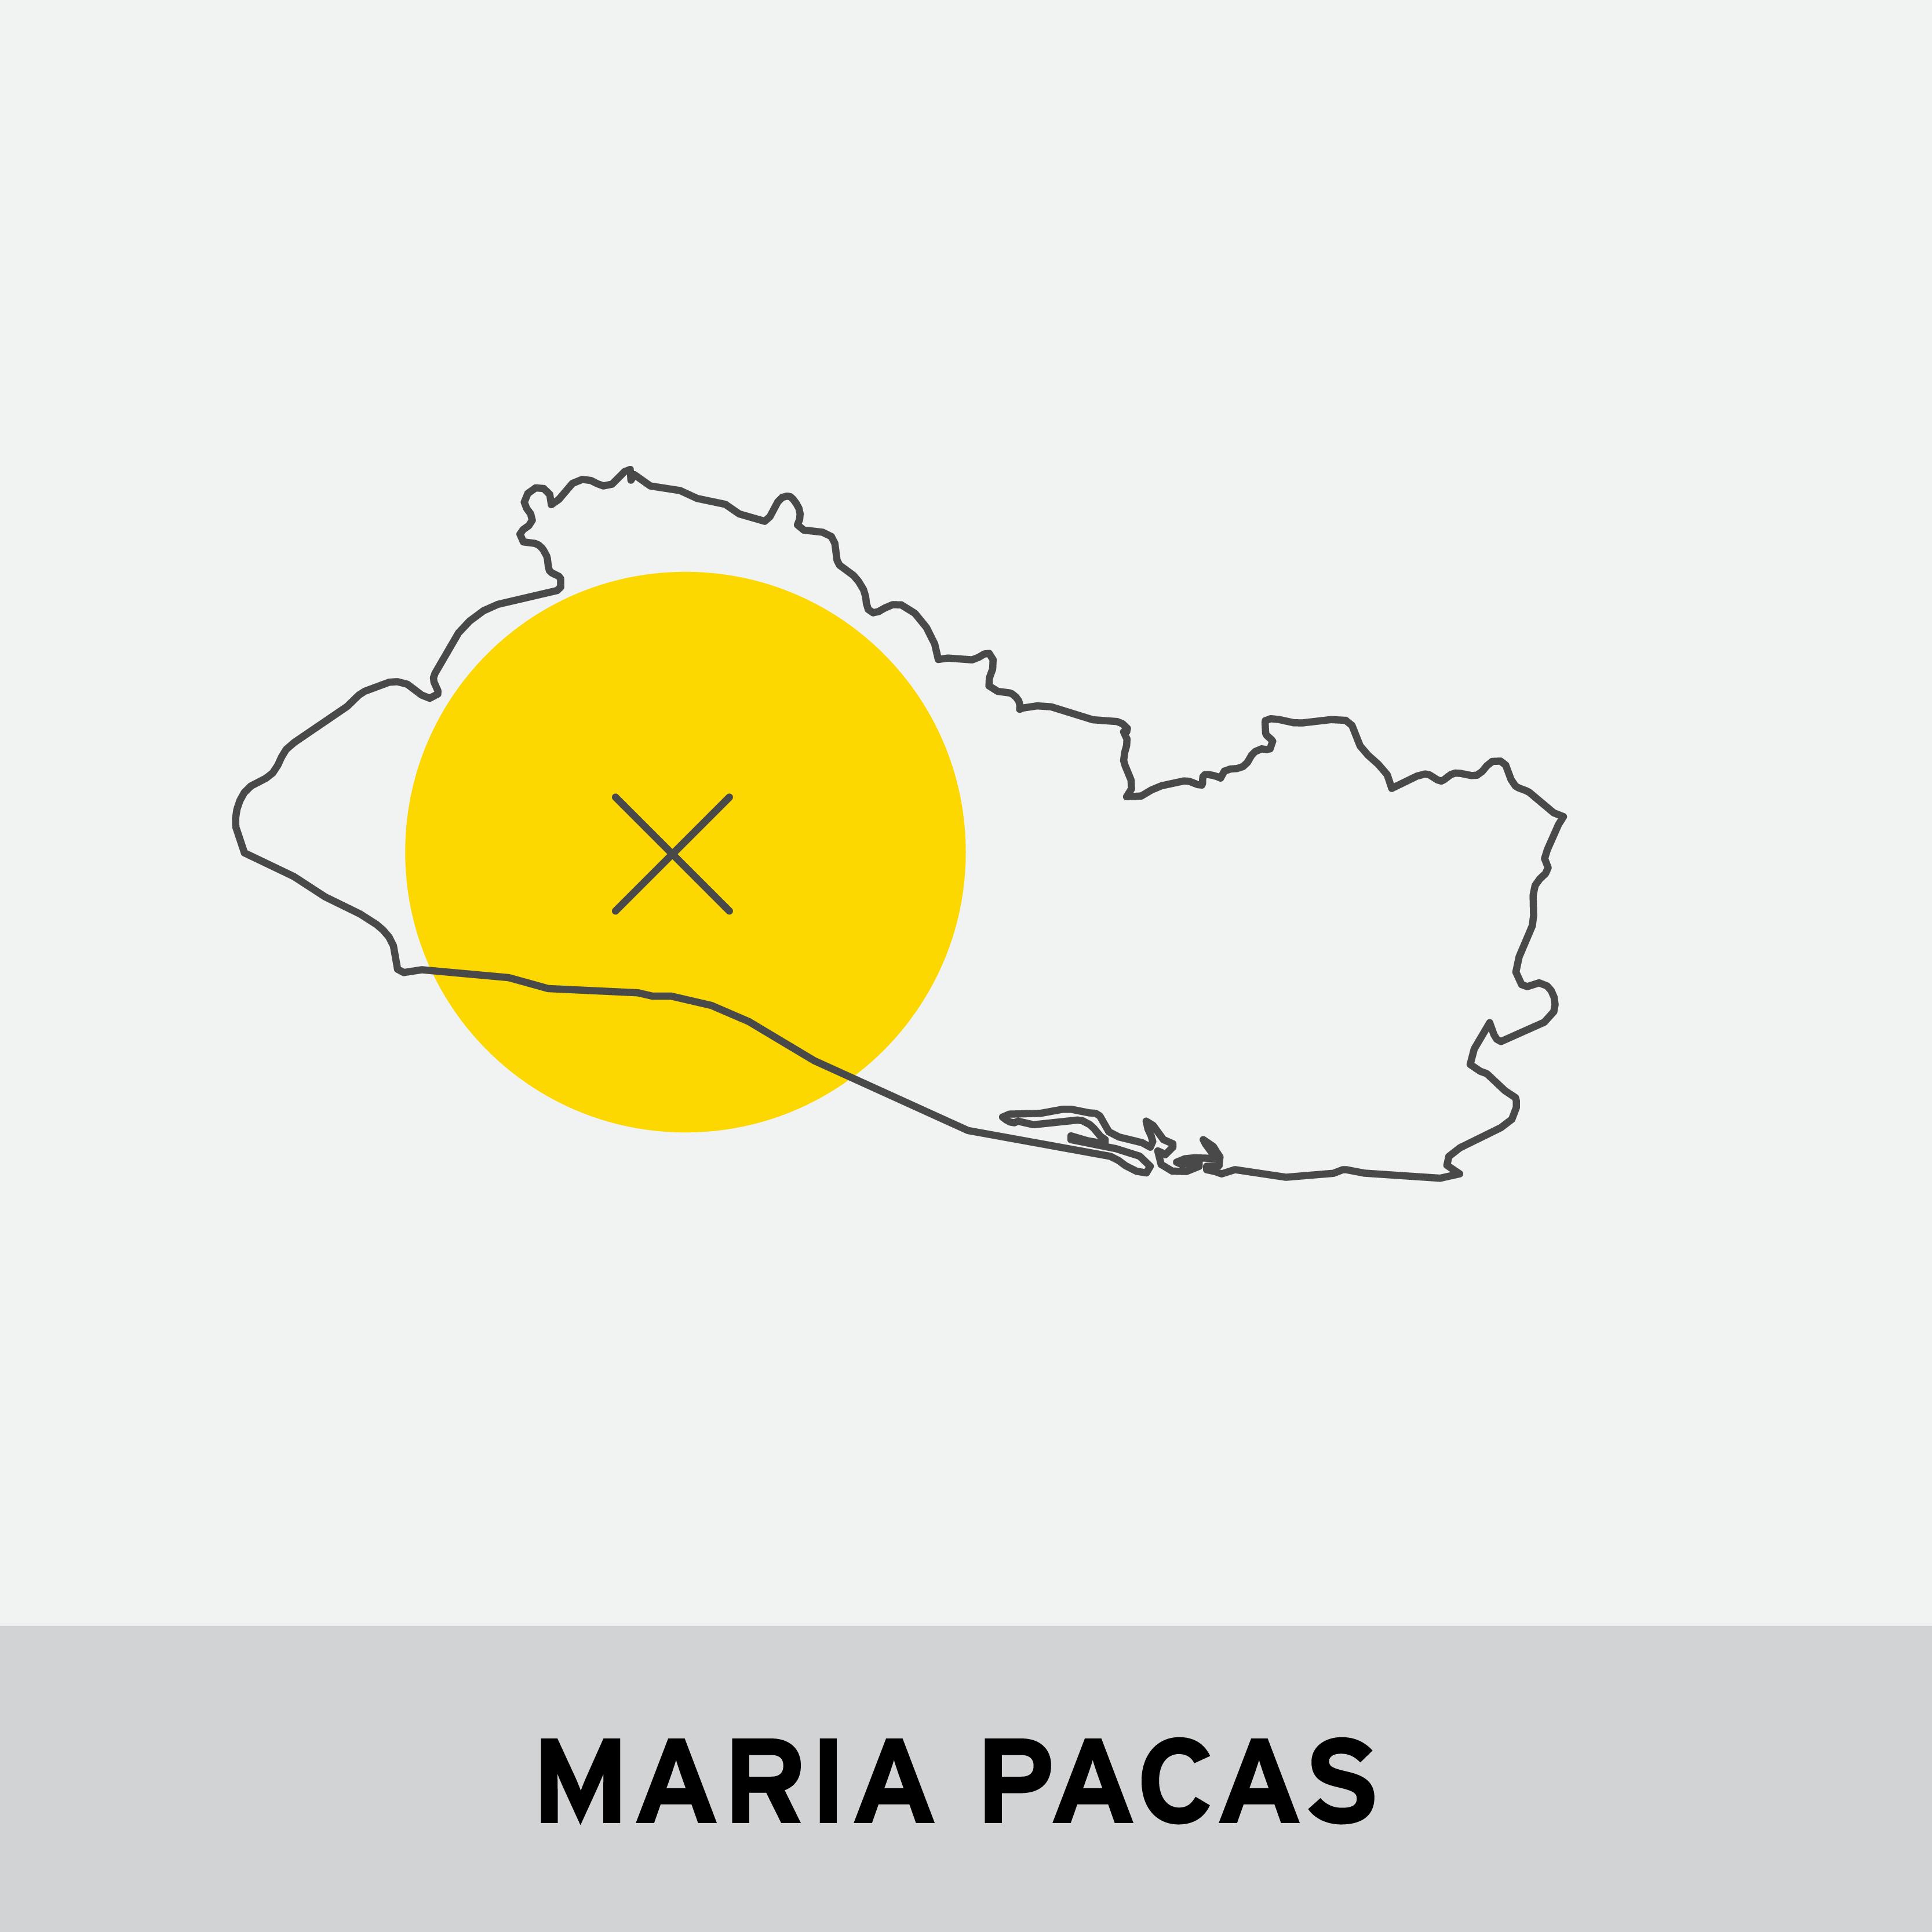 MARIA PACAS – EL RETIRO